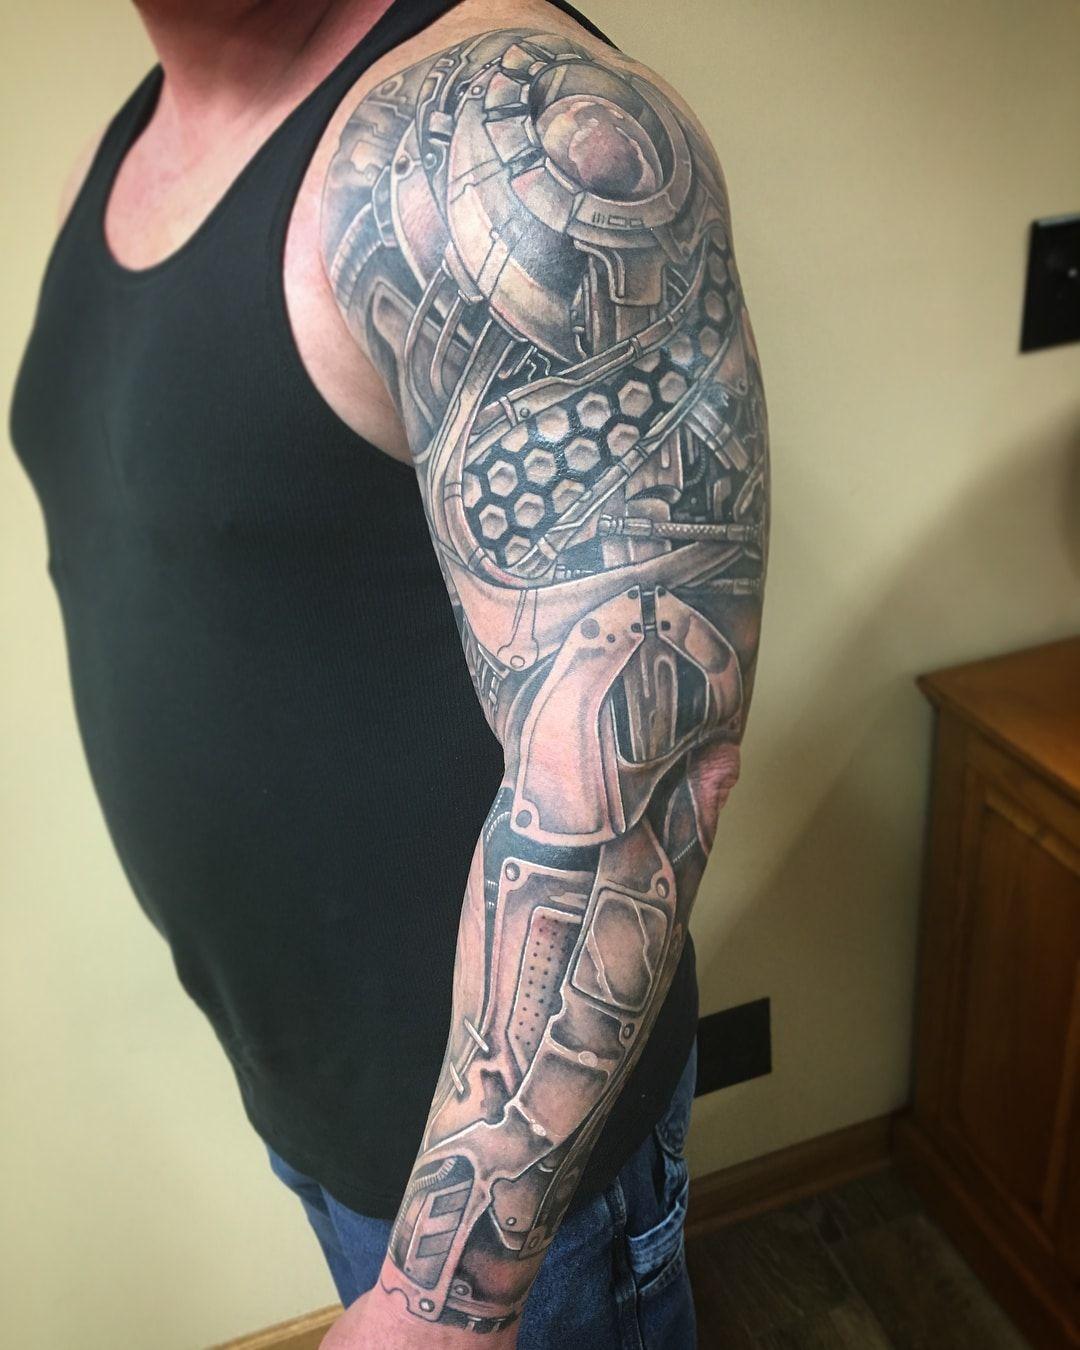 101 Amazing Robot Arm Tattoo Ideas That Will Blow Your Mind In 2020 Biomechanical Tattoo Design Tattoos Arm Tattoo